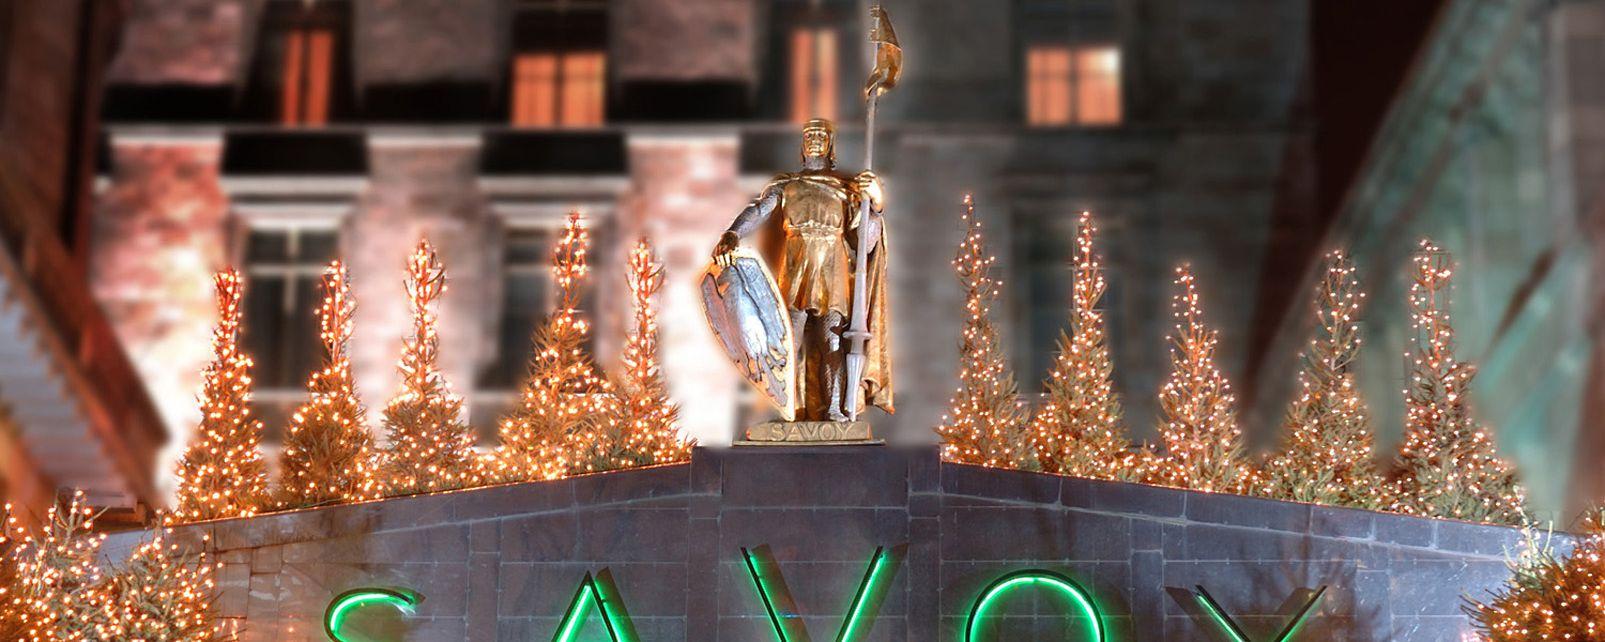 Hôtel The Savoy